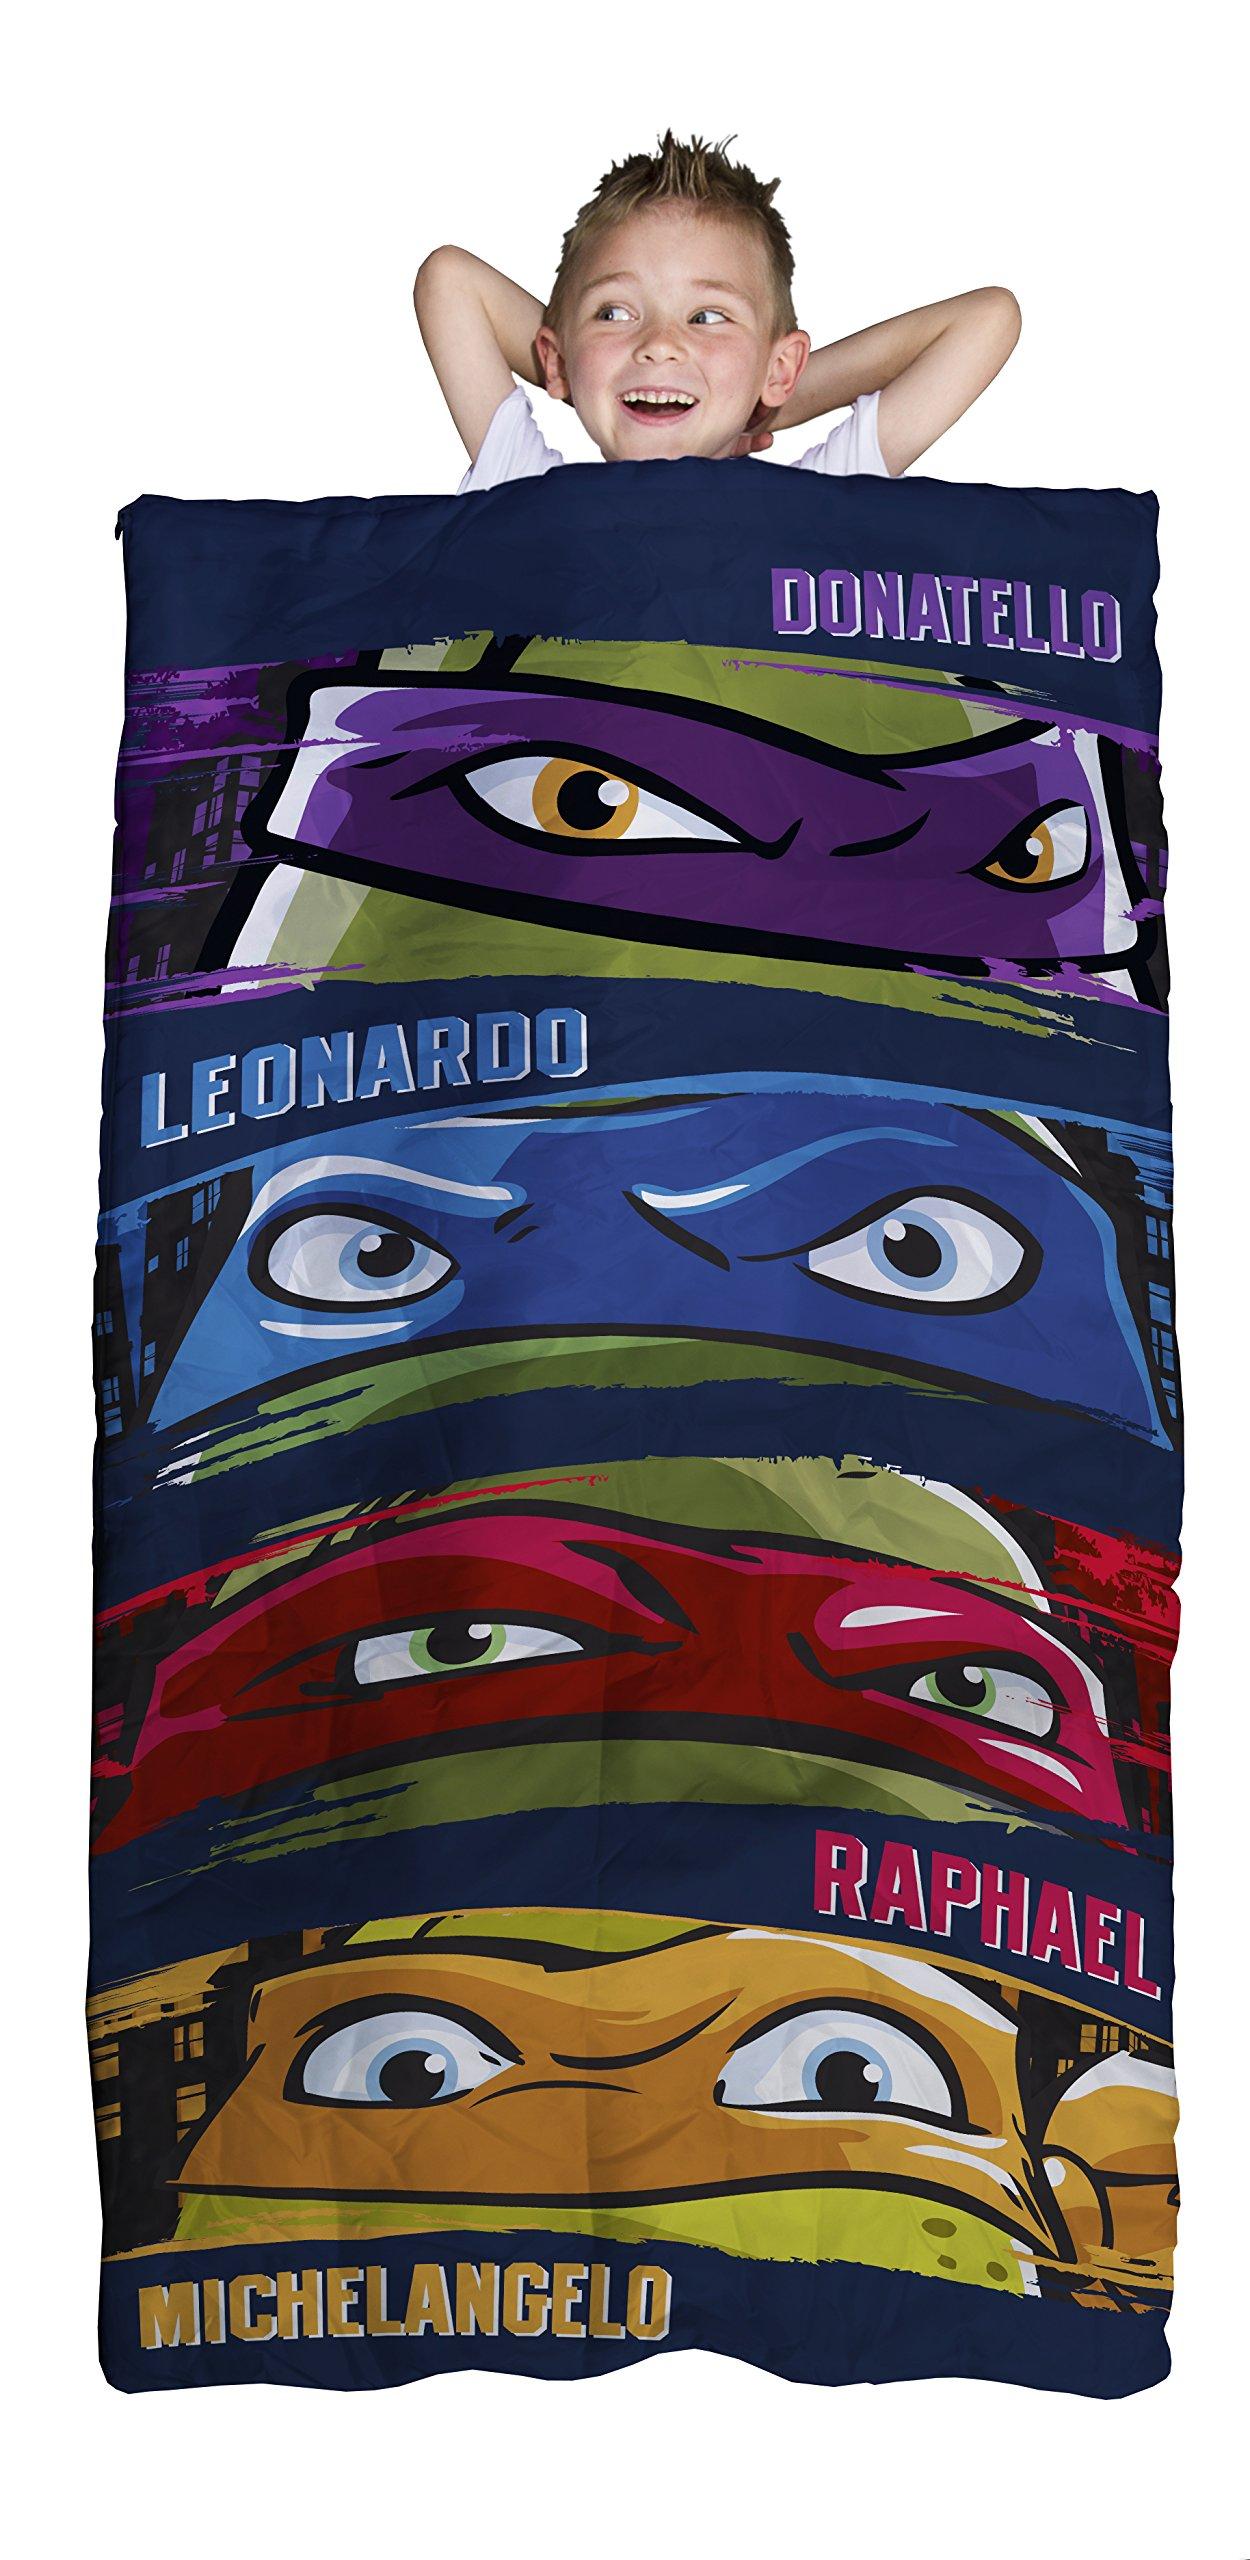 Nickelodeon Teenage Mutant Ninja Turtles Slumber Bag, Bonus Backpack with Straps, Turtle Faces